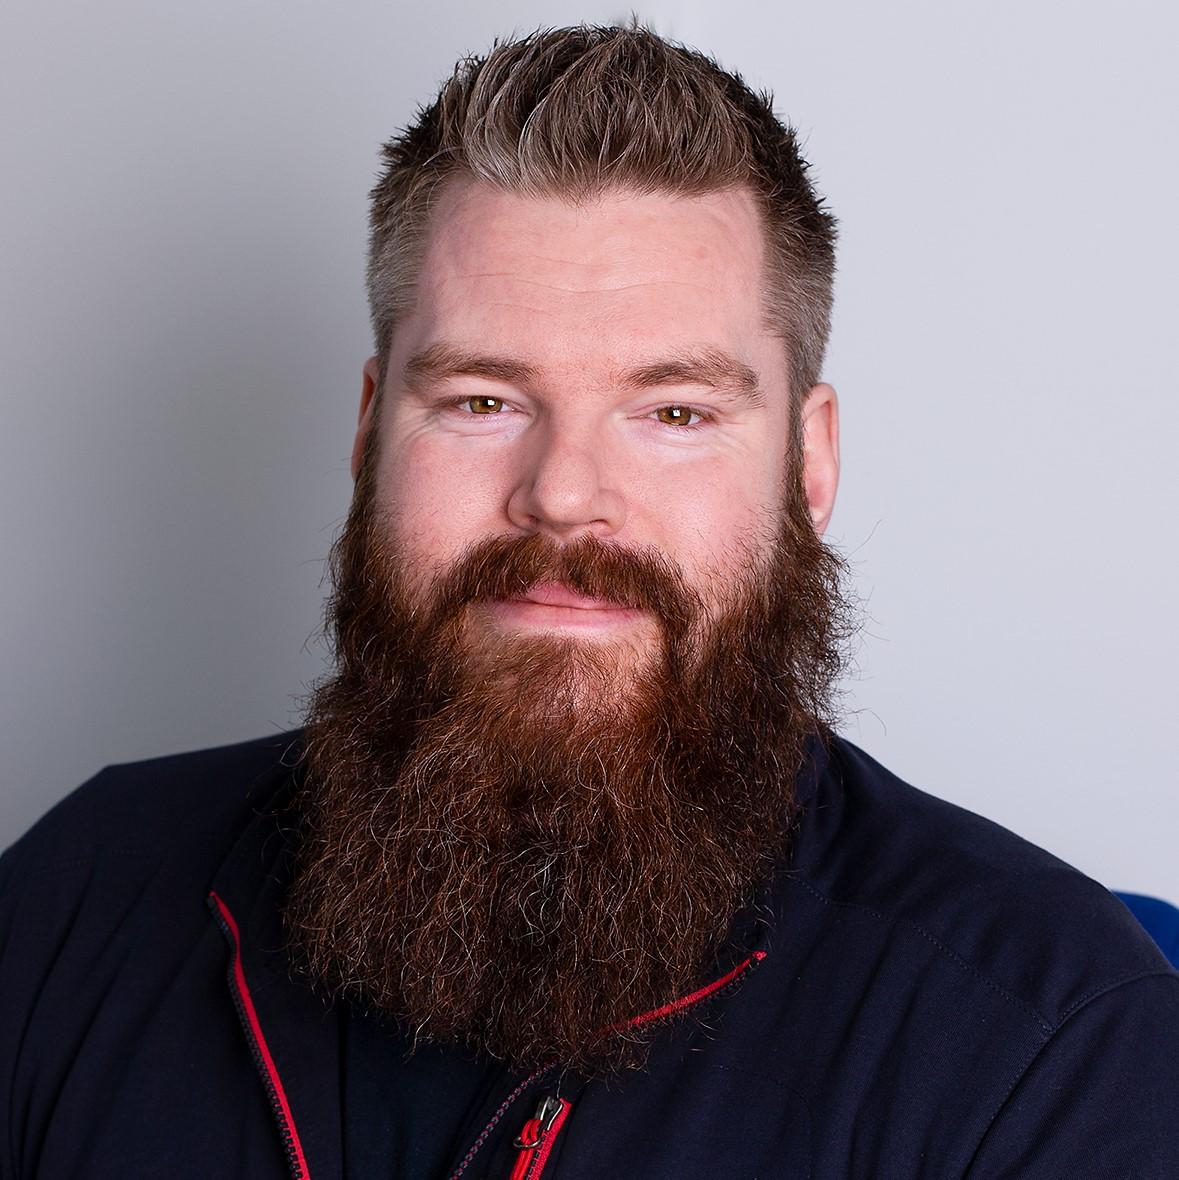 Daniel Gudmundsson